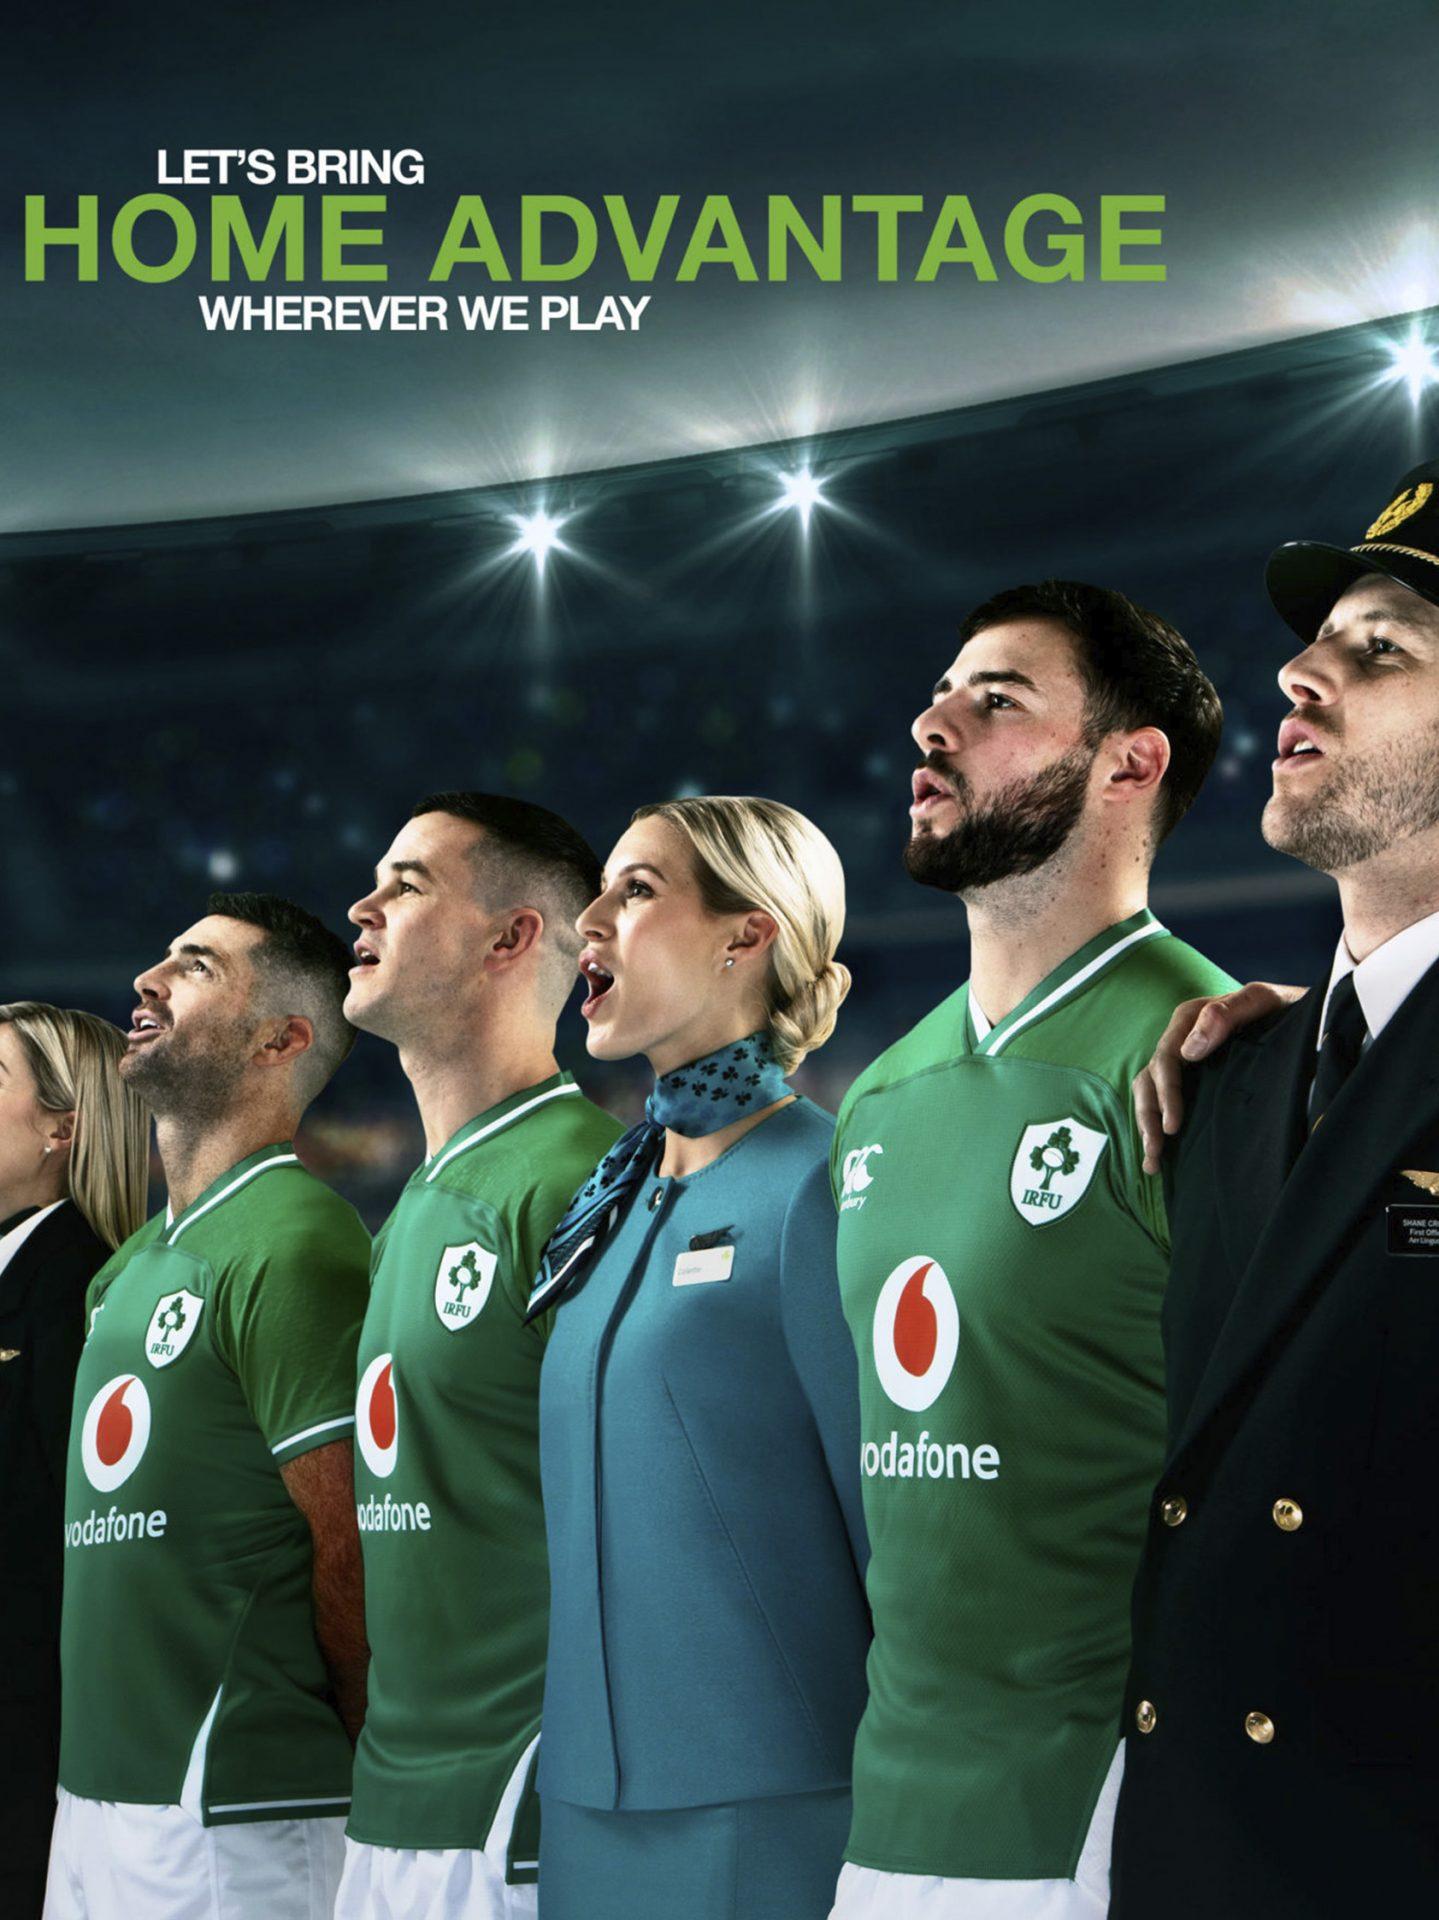 Aer Lingus X Ireland rugby